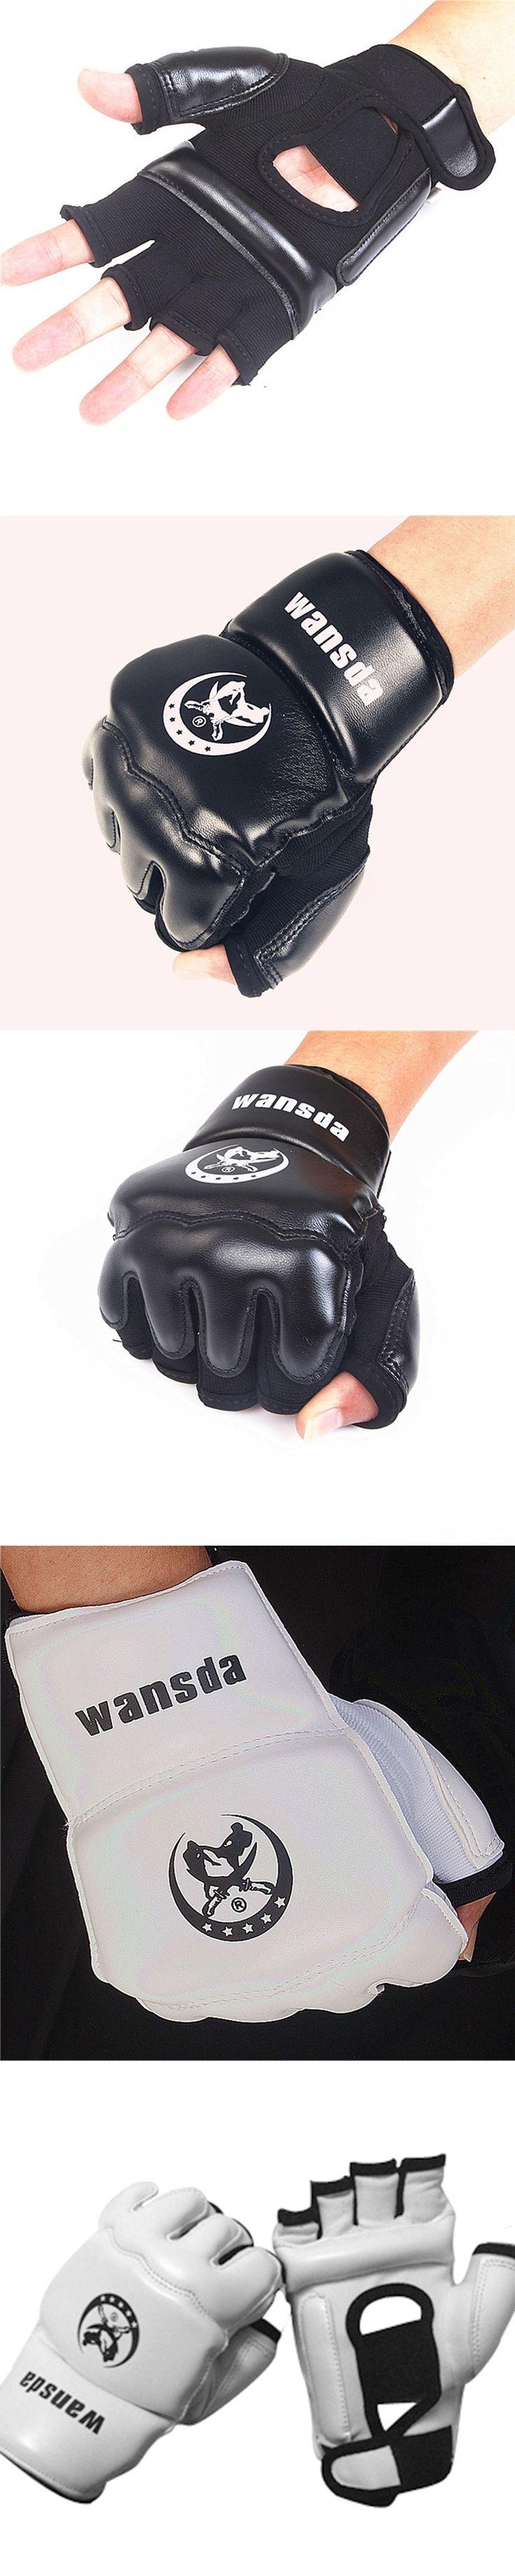 Adults/Kids Half Fingers Boxing Gloves Mitts Sanda Karate Sandbag Taekwondo Protector For Boxeo MMA Punch